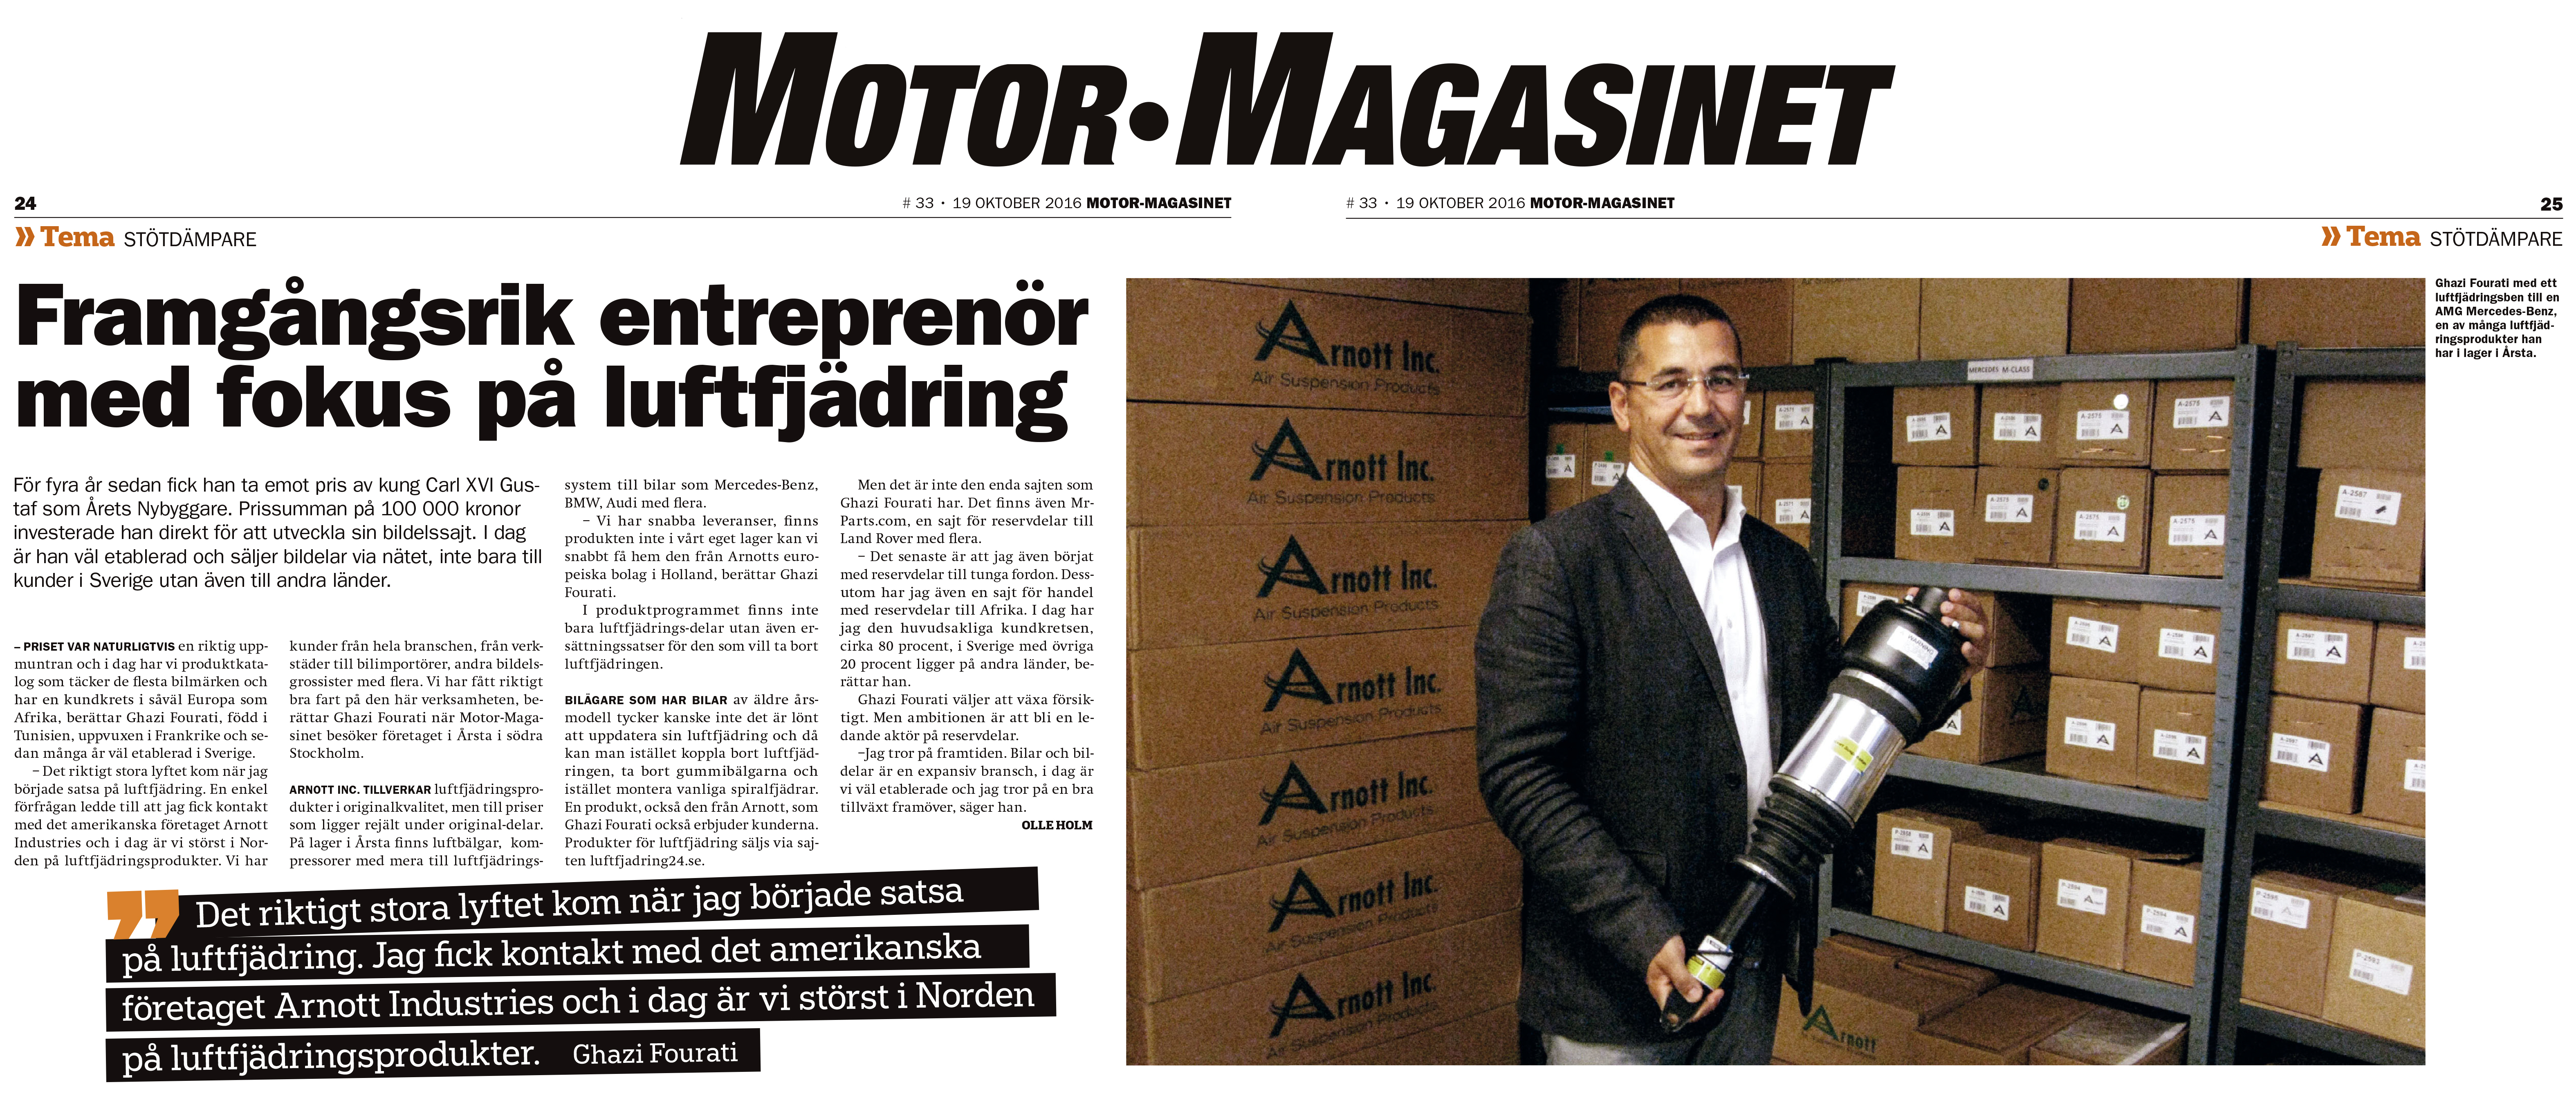 ghazi fourati motormagazinet